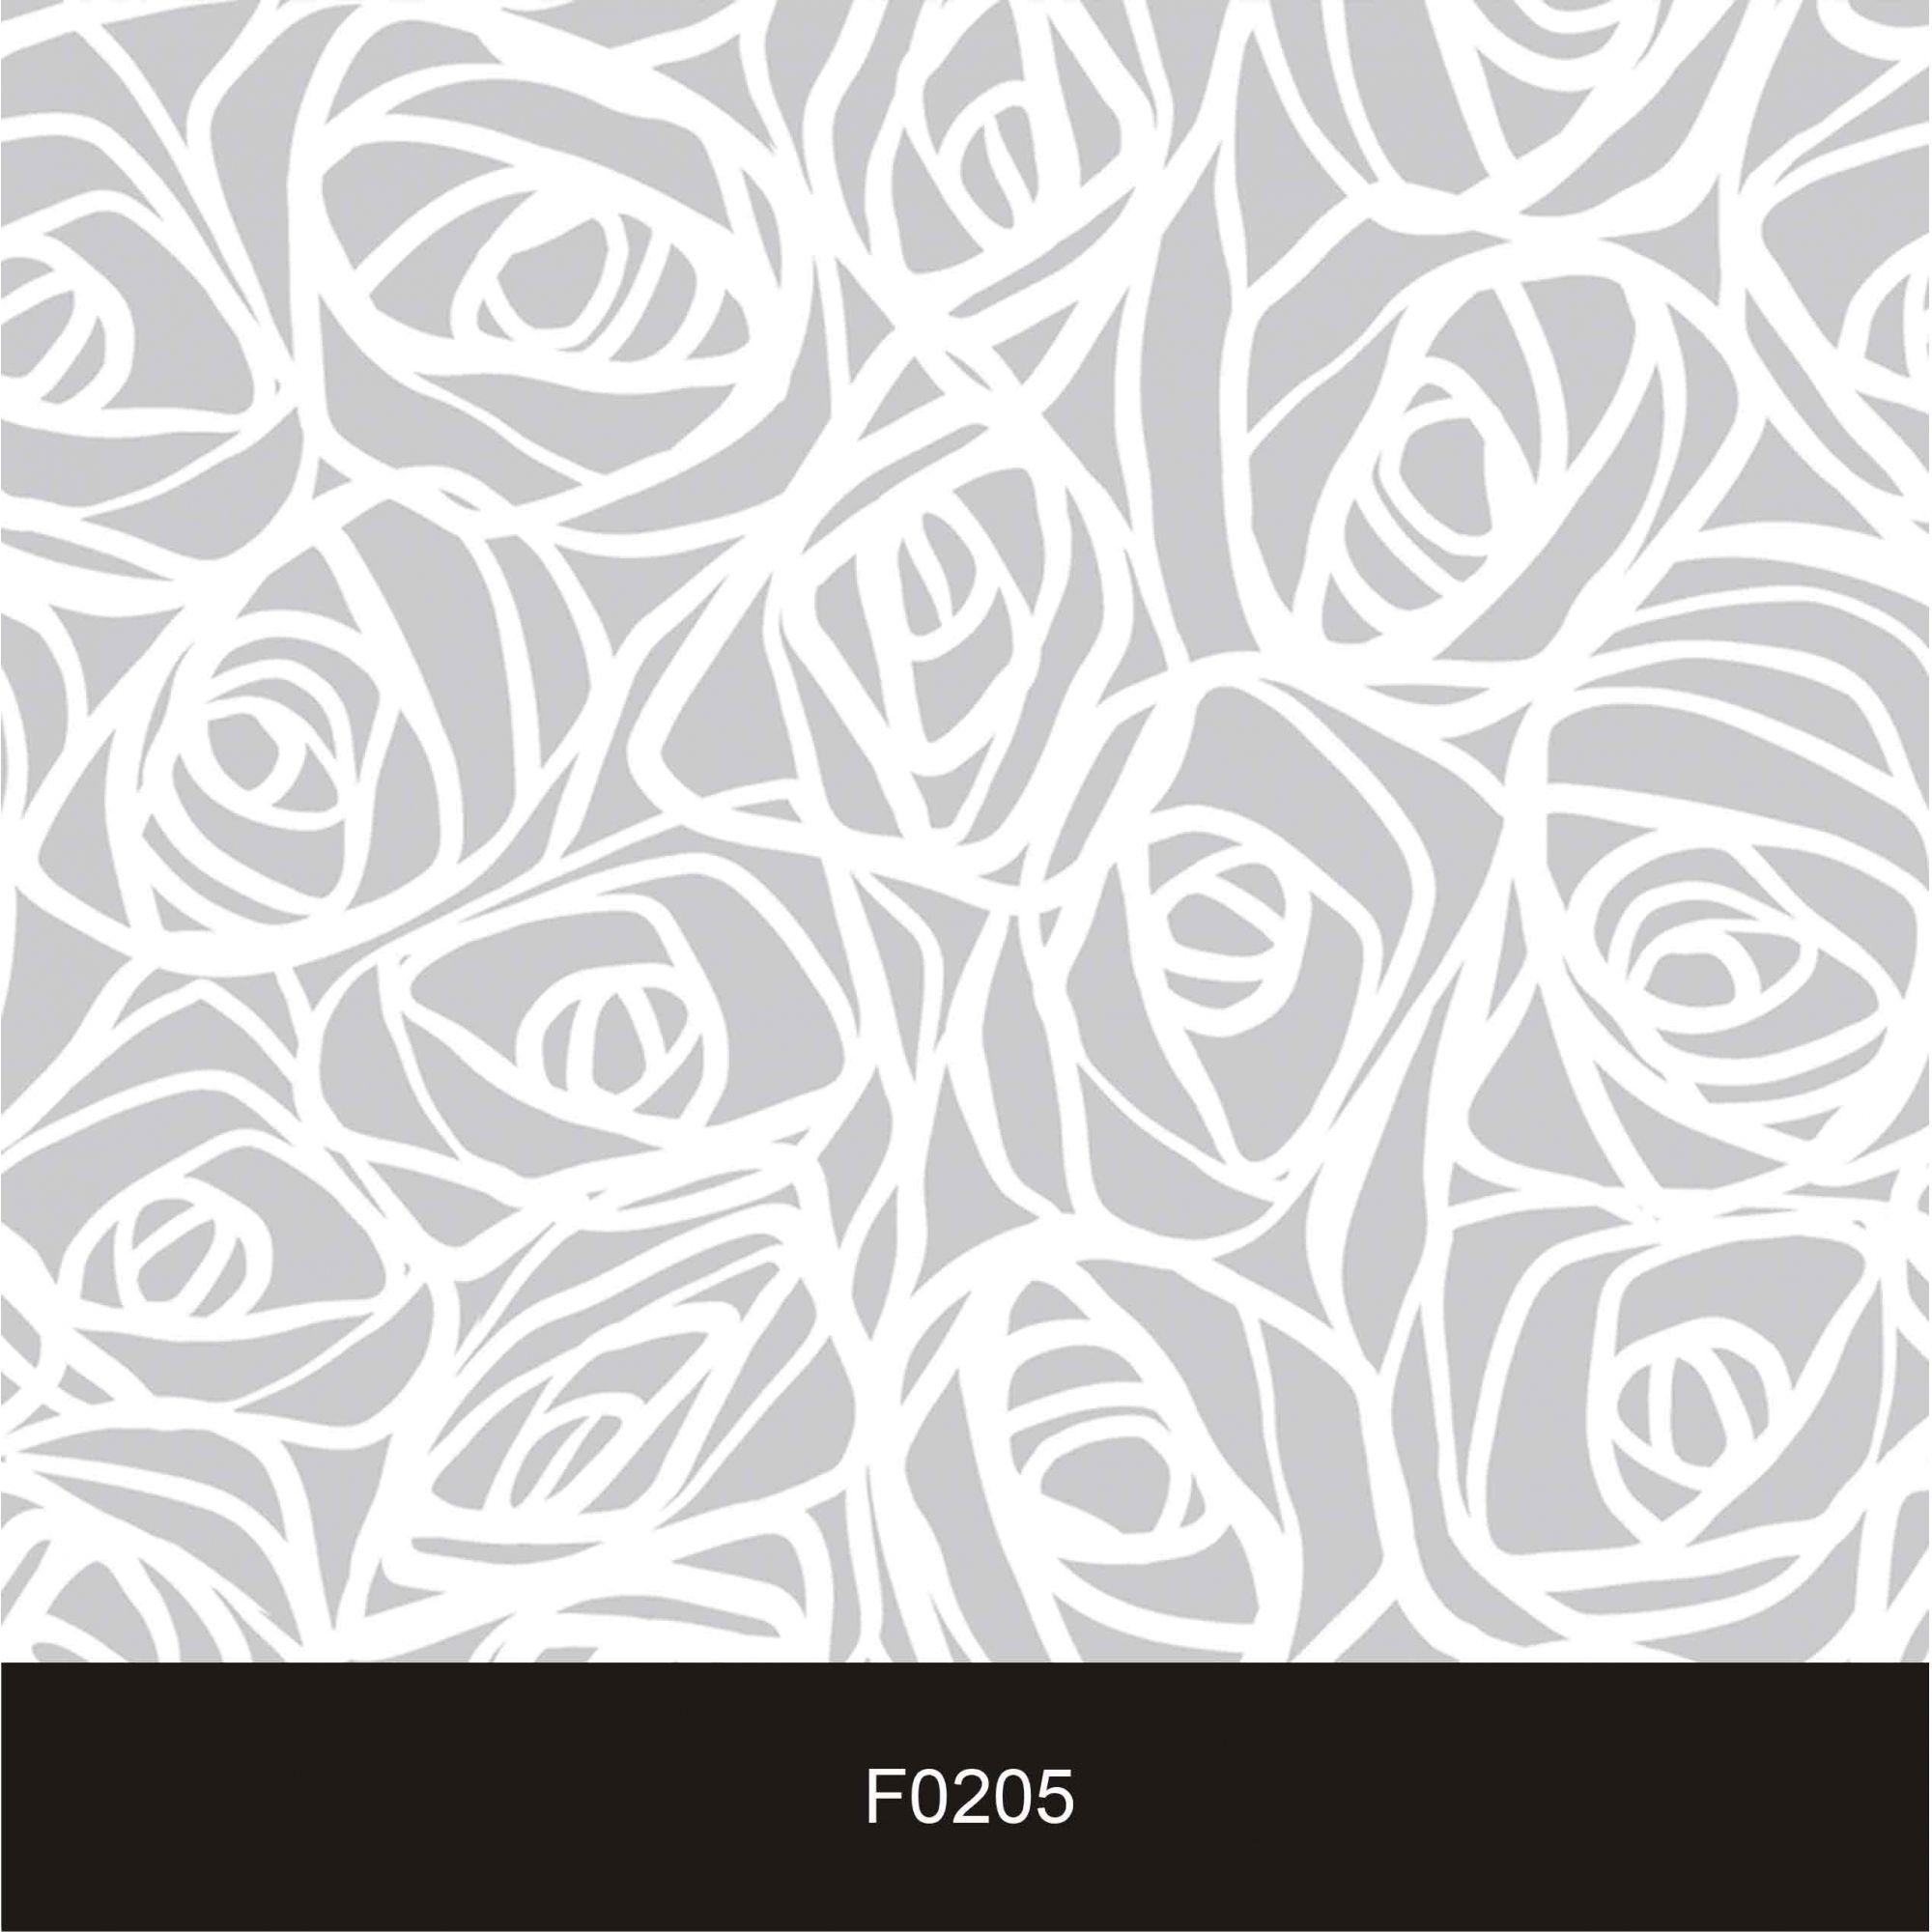 Papel de Parede Auto  Adesivo Floral, Cinza e Branco Clean F0205  - Final Decor